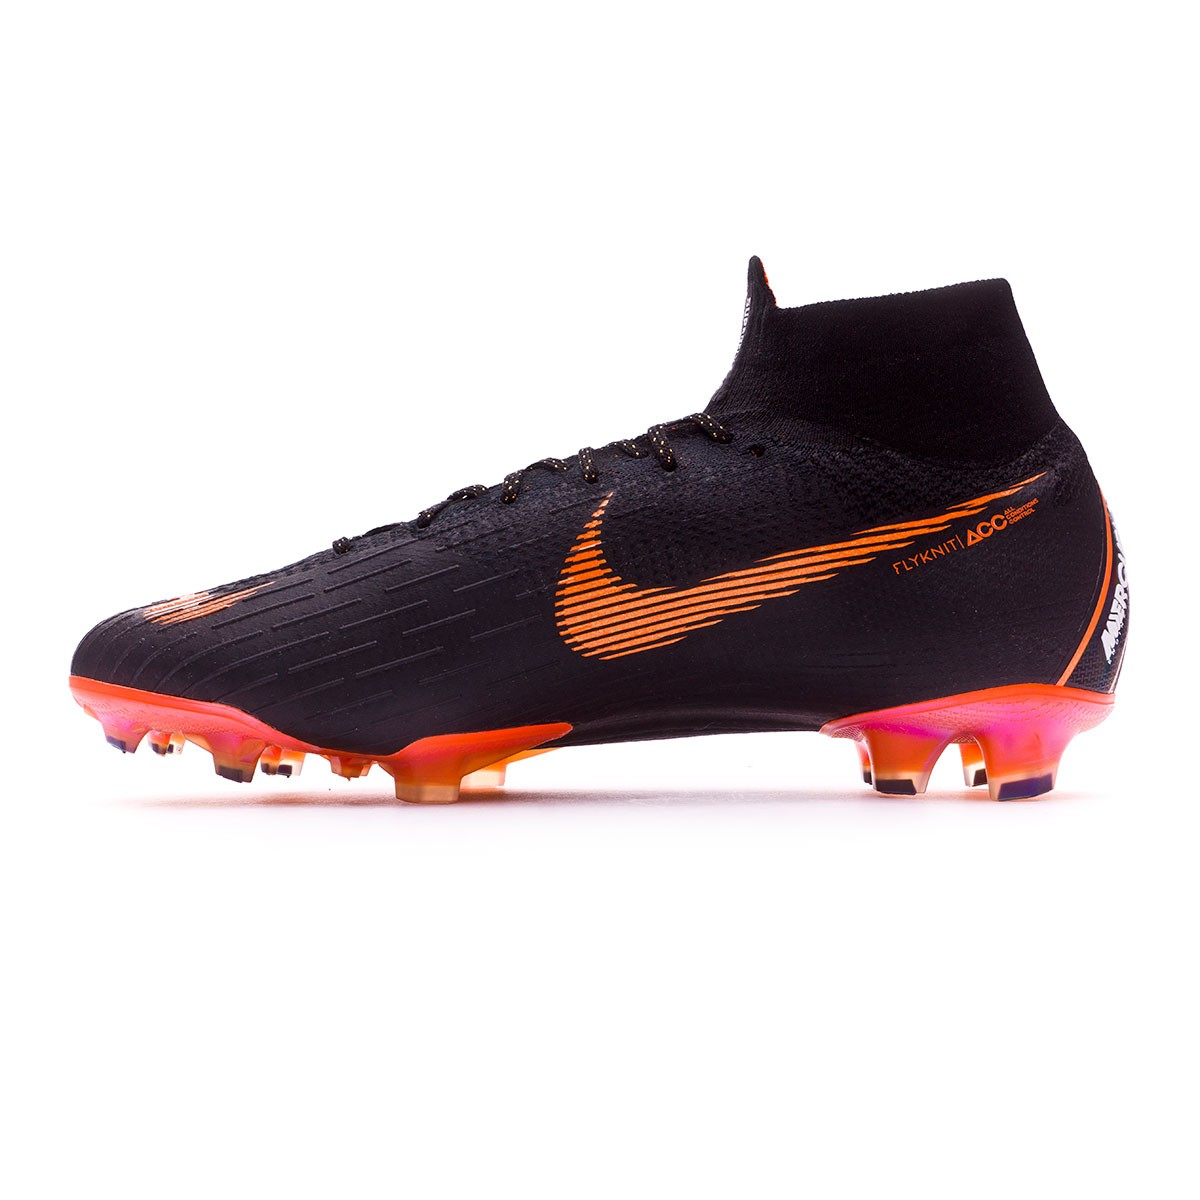 new style 71b0c 2c092 Chaussure de foot Nike Mercurial Superfly VI Elite FG Black-Total  orange-White - Boutique de football Fútbol Emotion